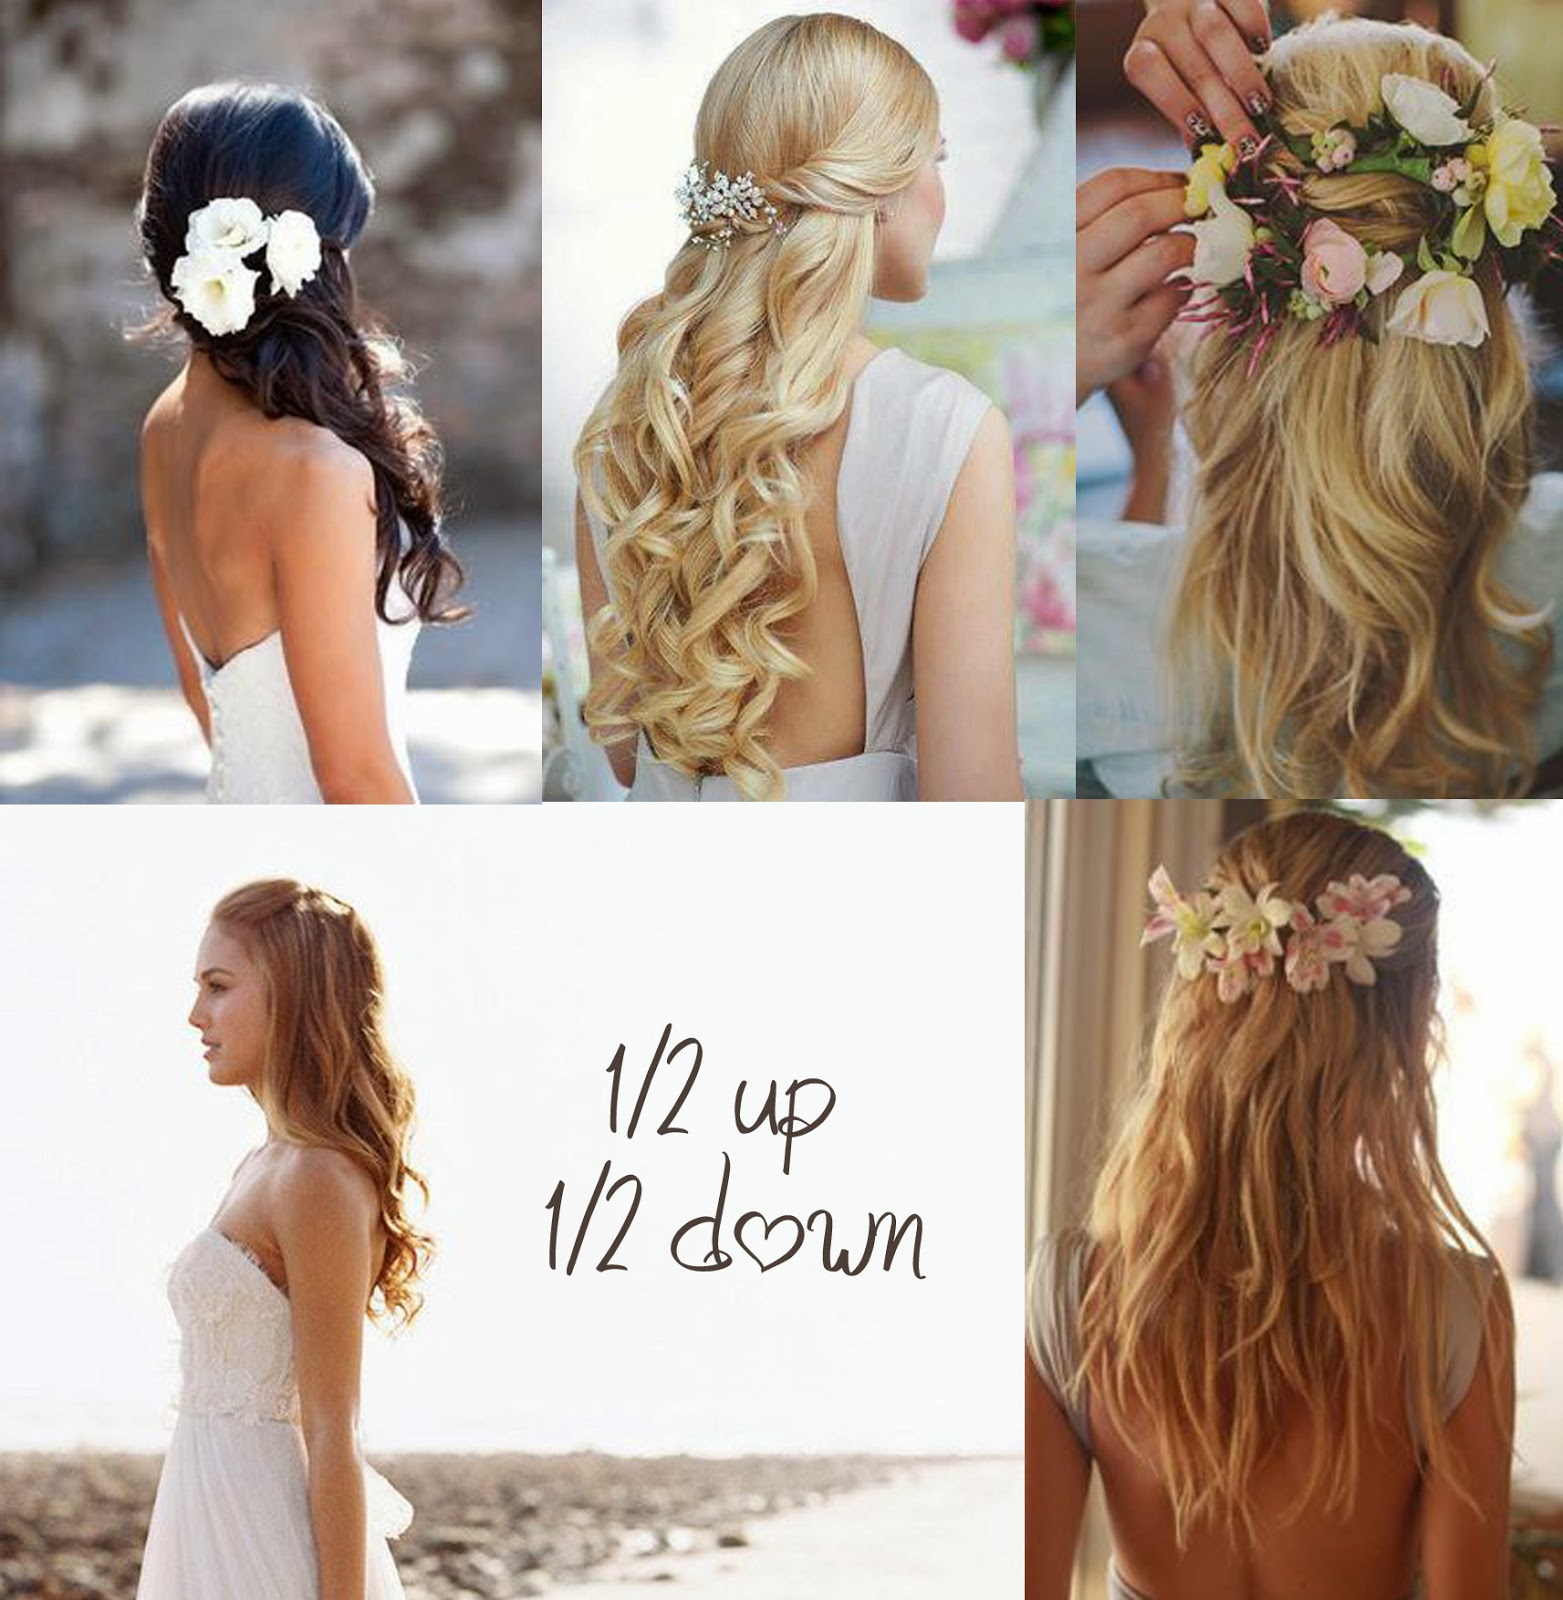 Natasha Wedding Essentials Vintage Bridal Hair Looks: Natasha Wedding Essentials: Summer Beach Wedding Ideas